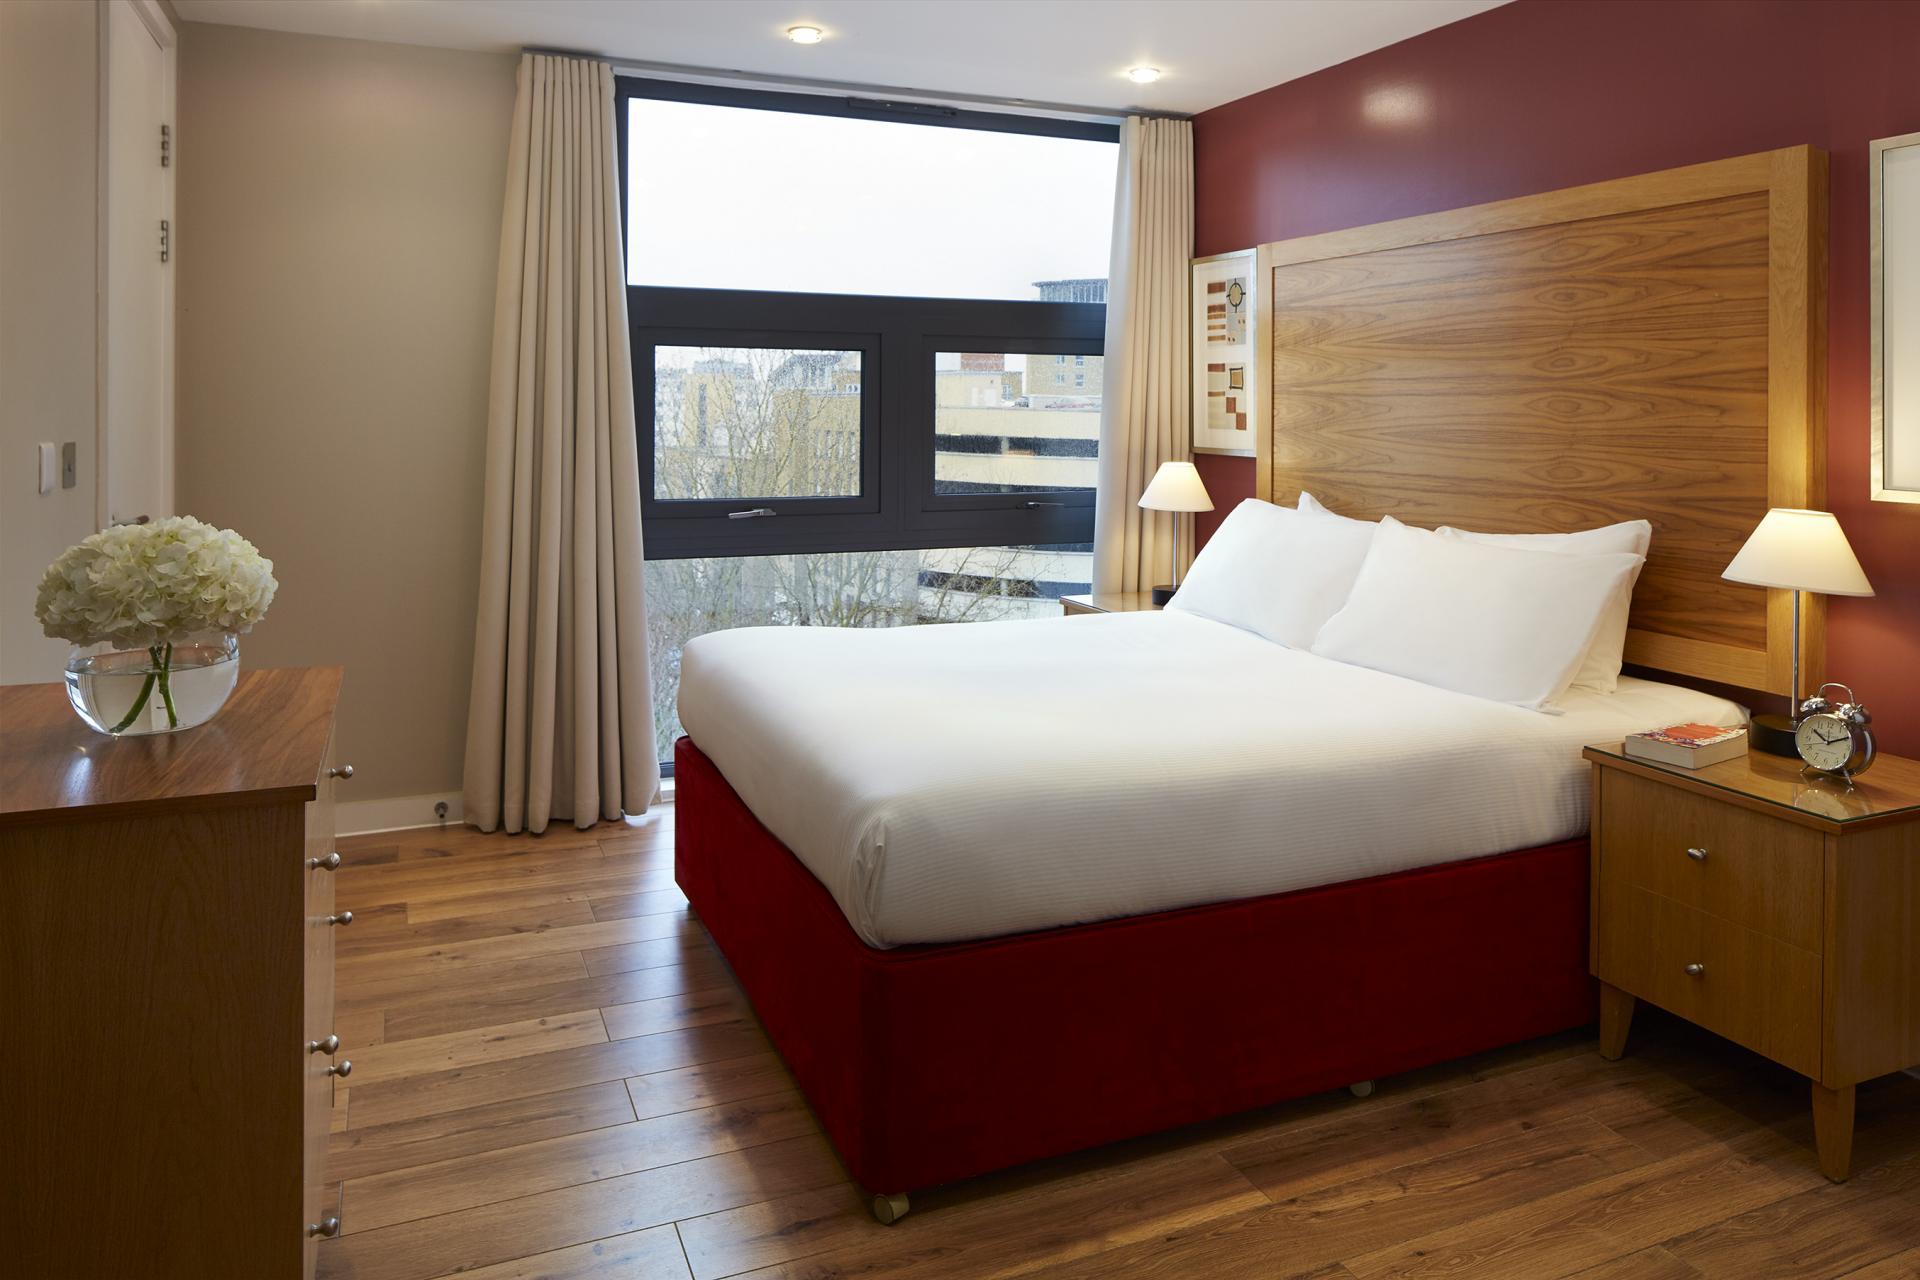 Bedroom at Marlin Canary Wharf Apartments, Canary Wharf, London